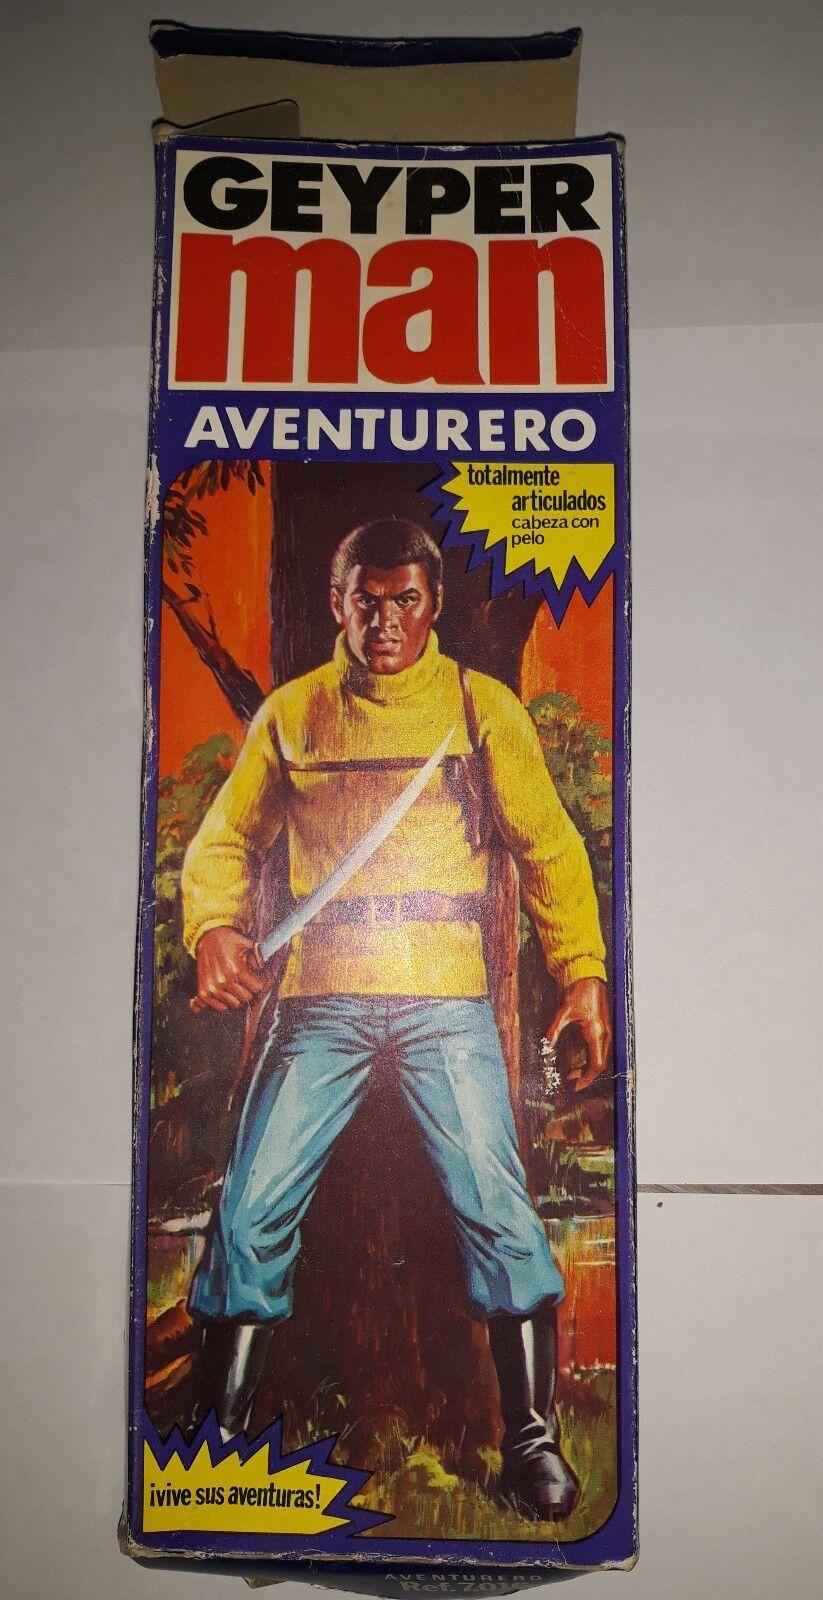 GEYPERMAN adventurero doll 1975 véritable Figure faite en Espagne, action man vintage